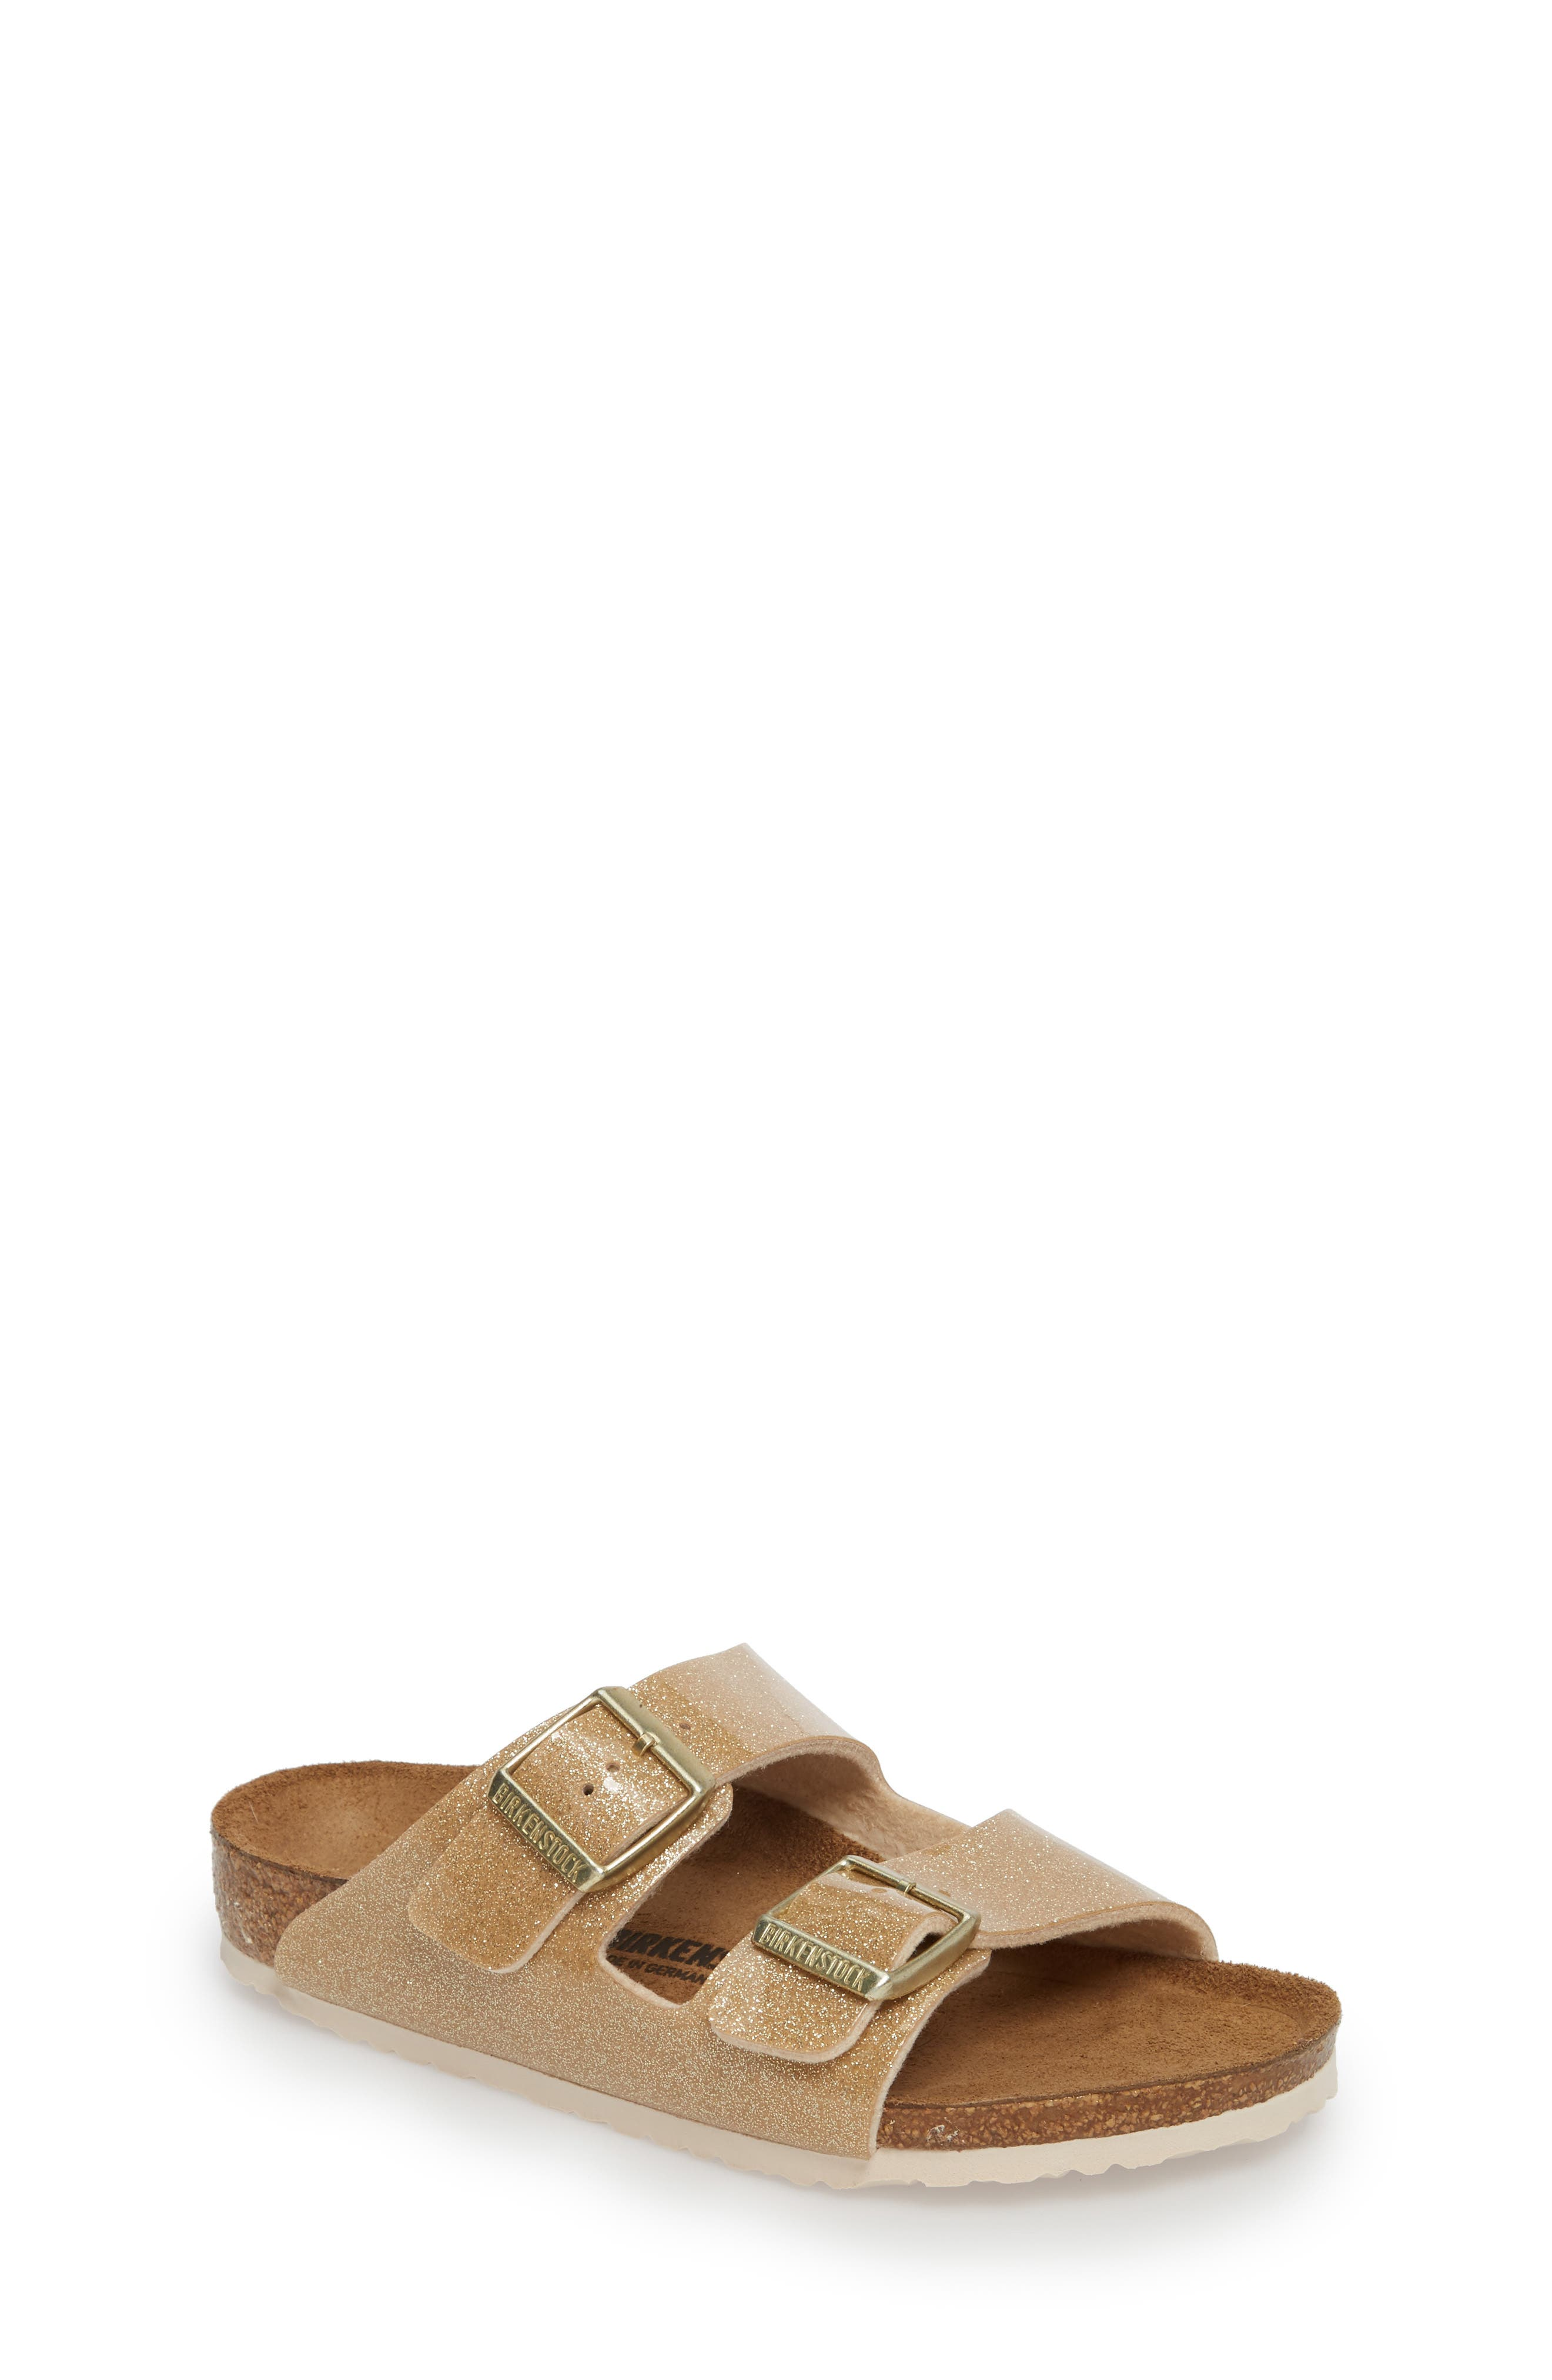 'Arizona Galaxy Birko-Flor' Slide Sandal,                         Main,                         color, Galaxy Gold